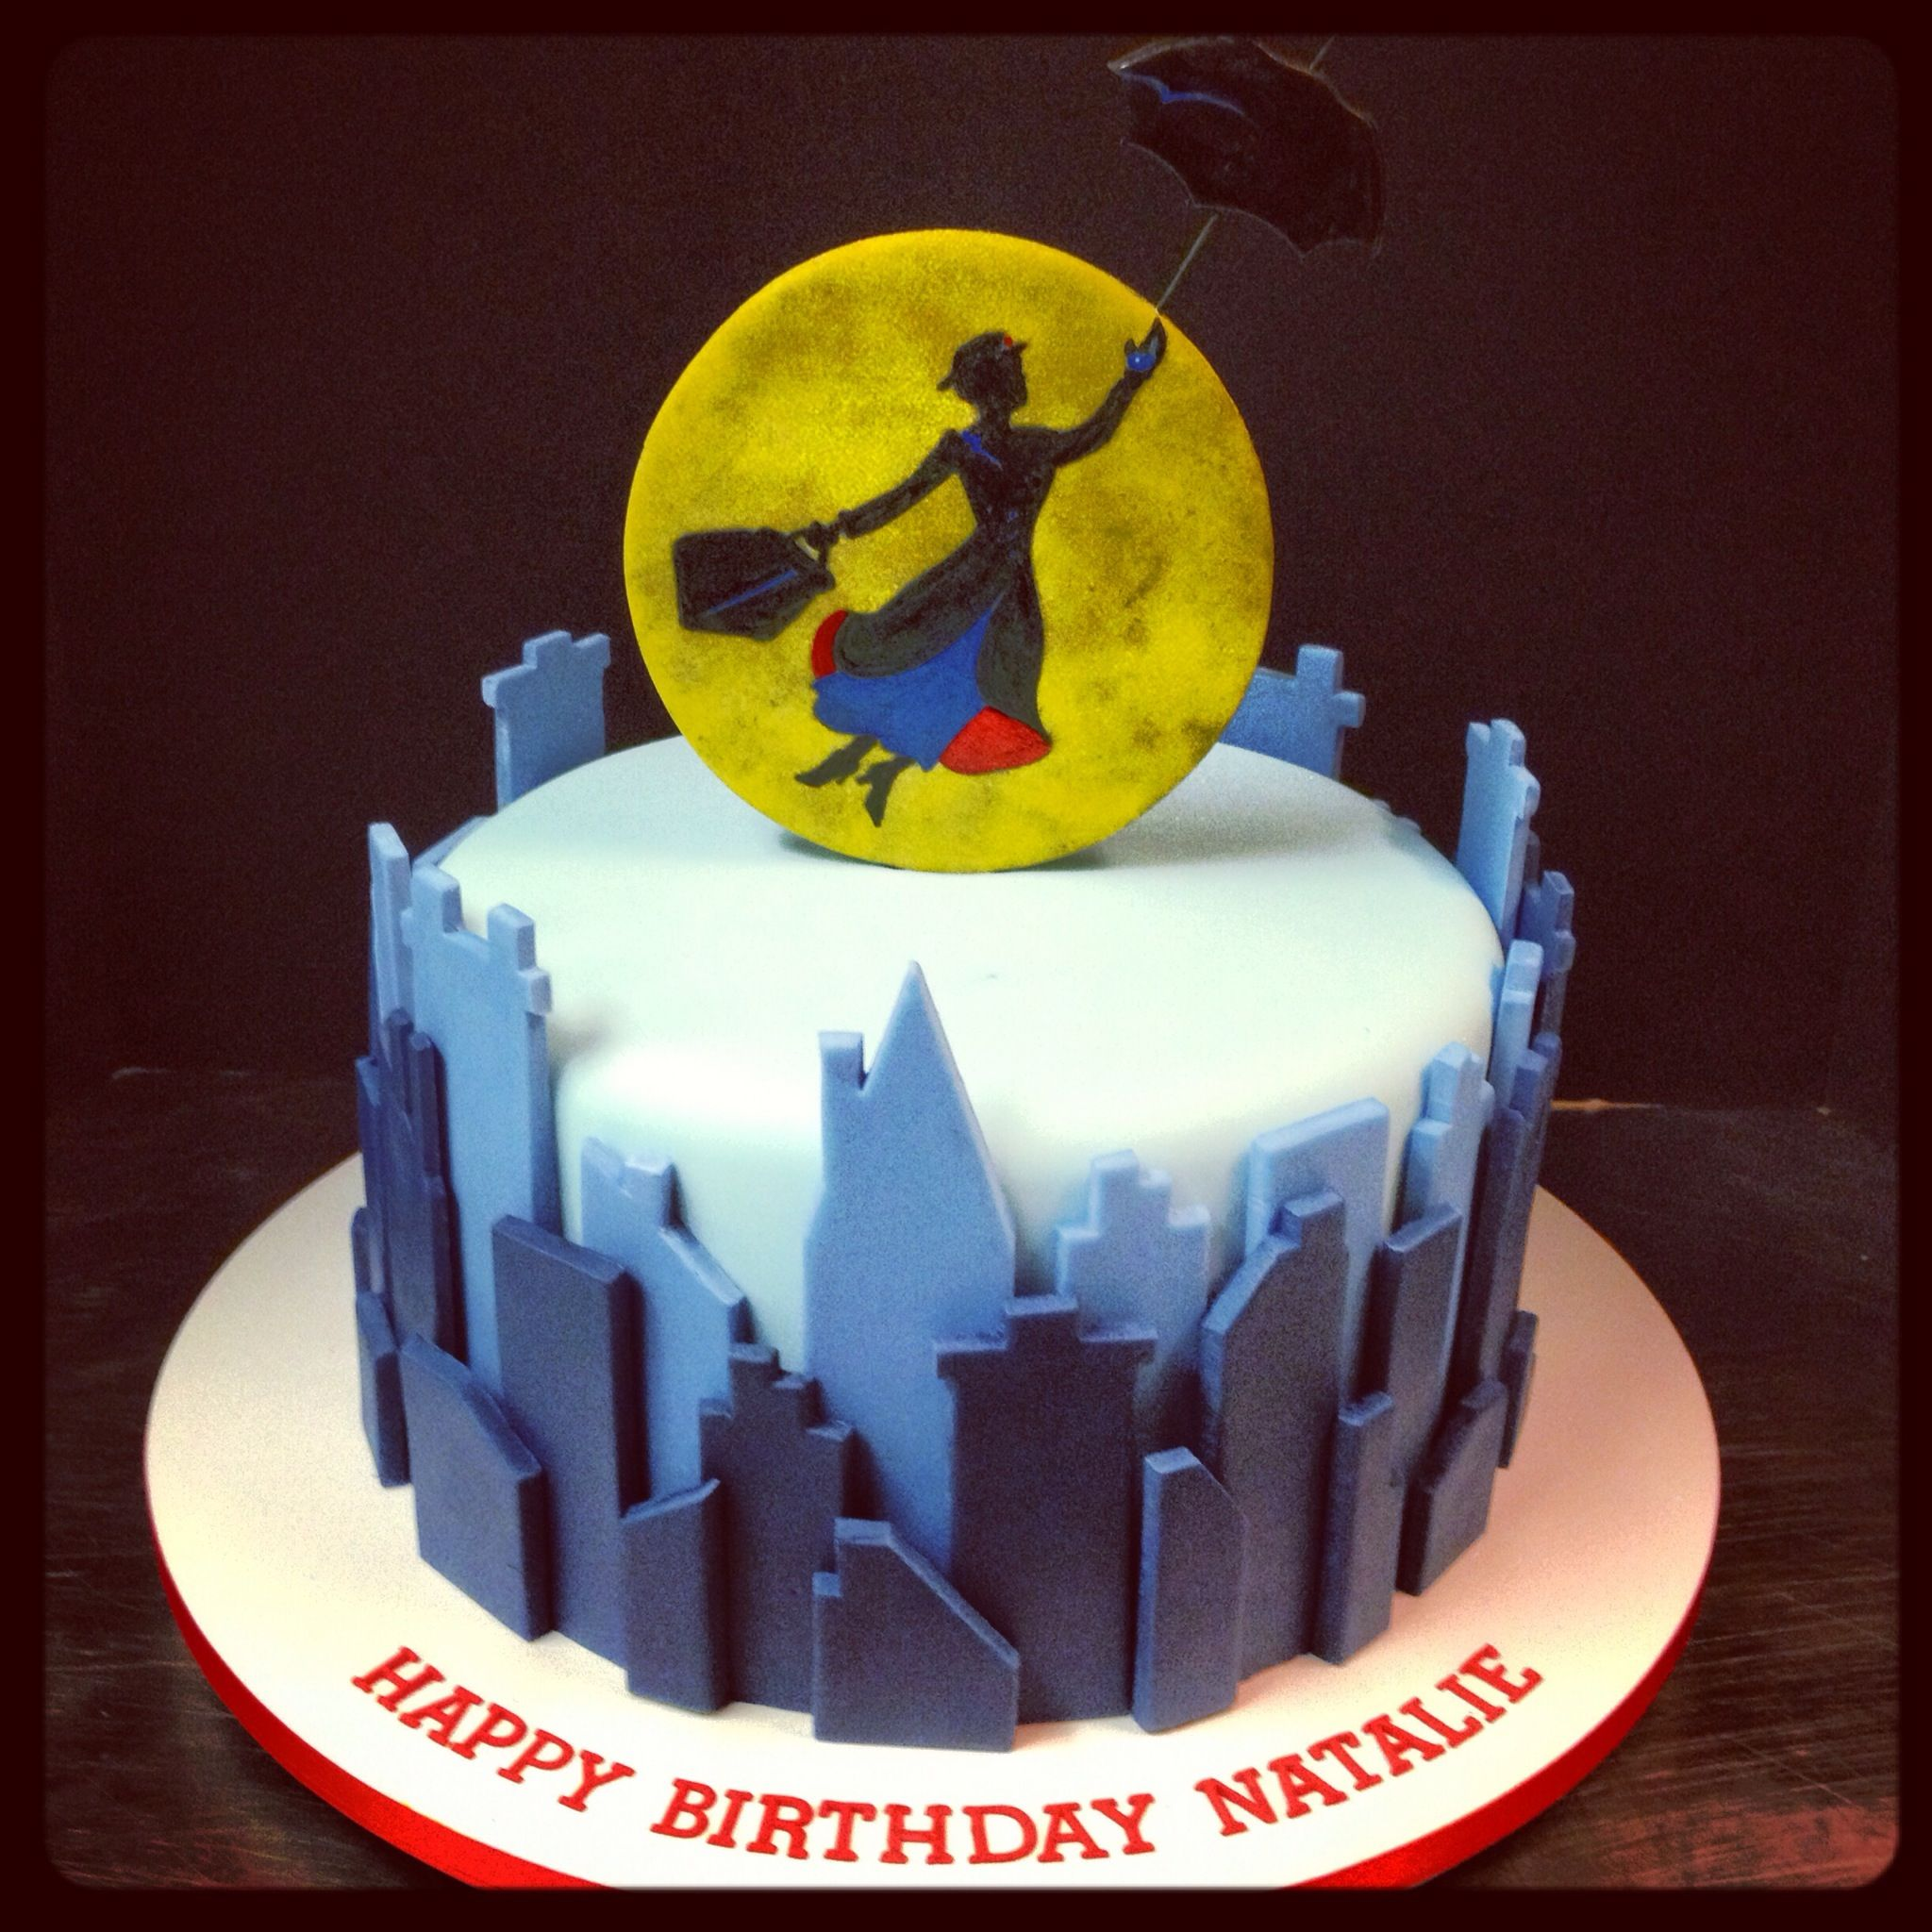 Mary poppins cake rachel gladis cakes citycakesny www mary poppins cake rachel gladis cakes citycakesny facebook sciox Images